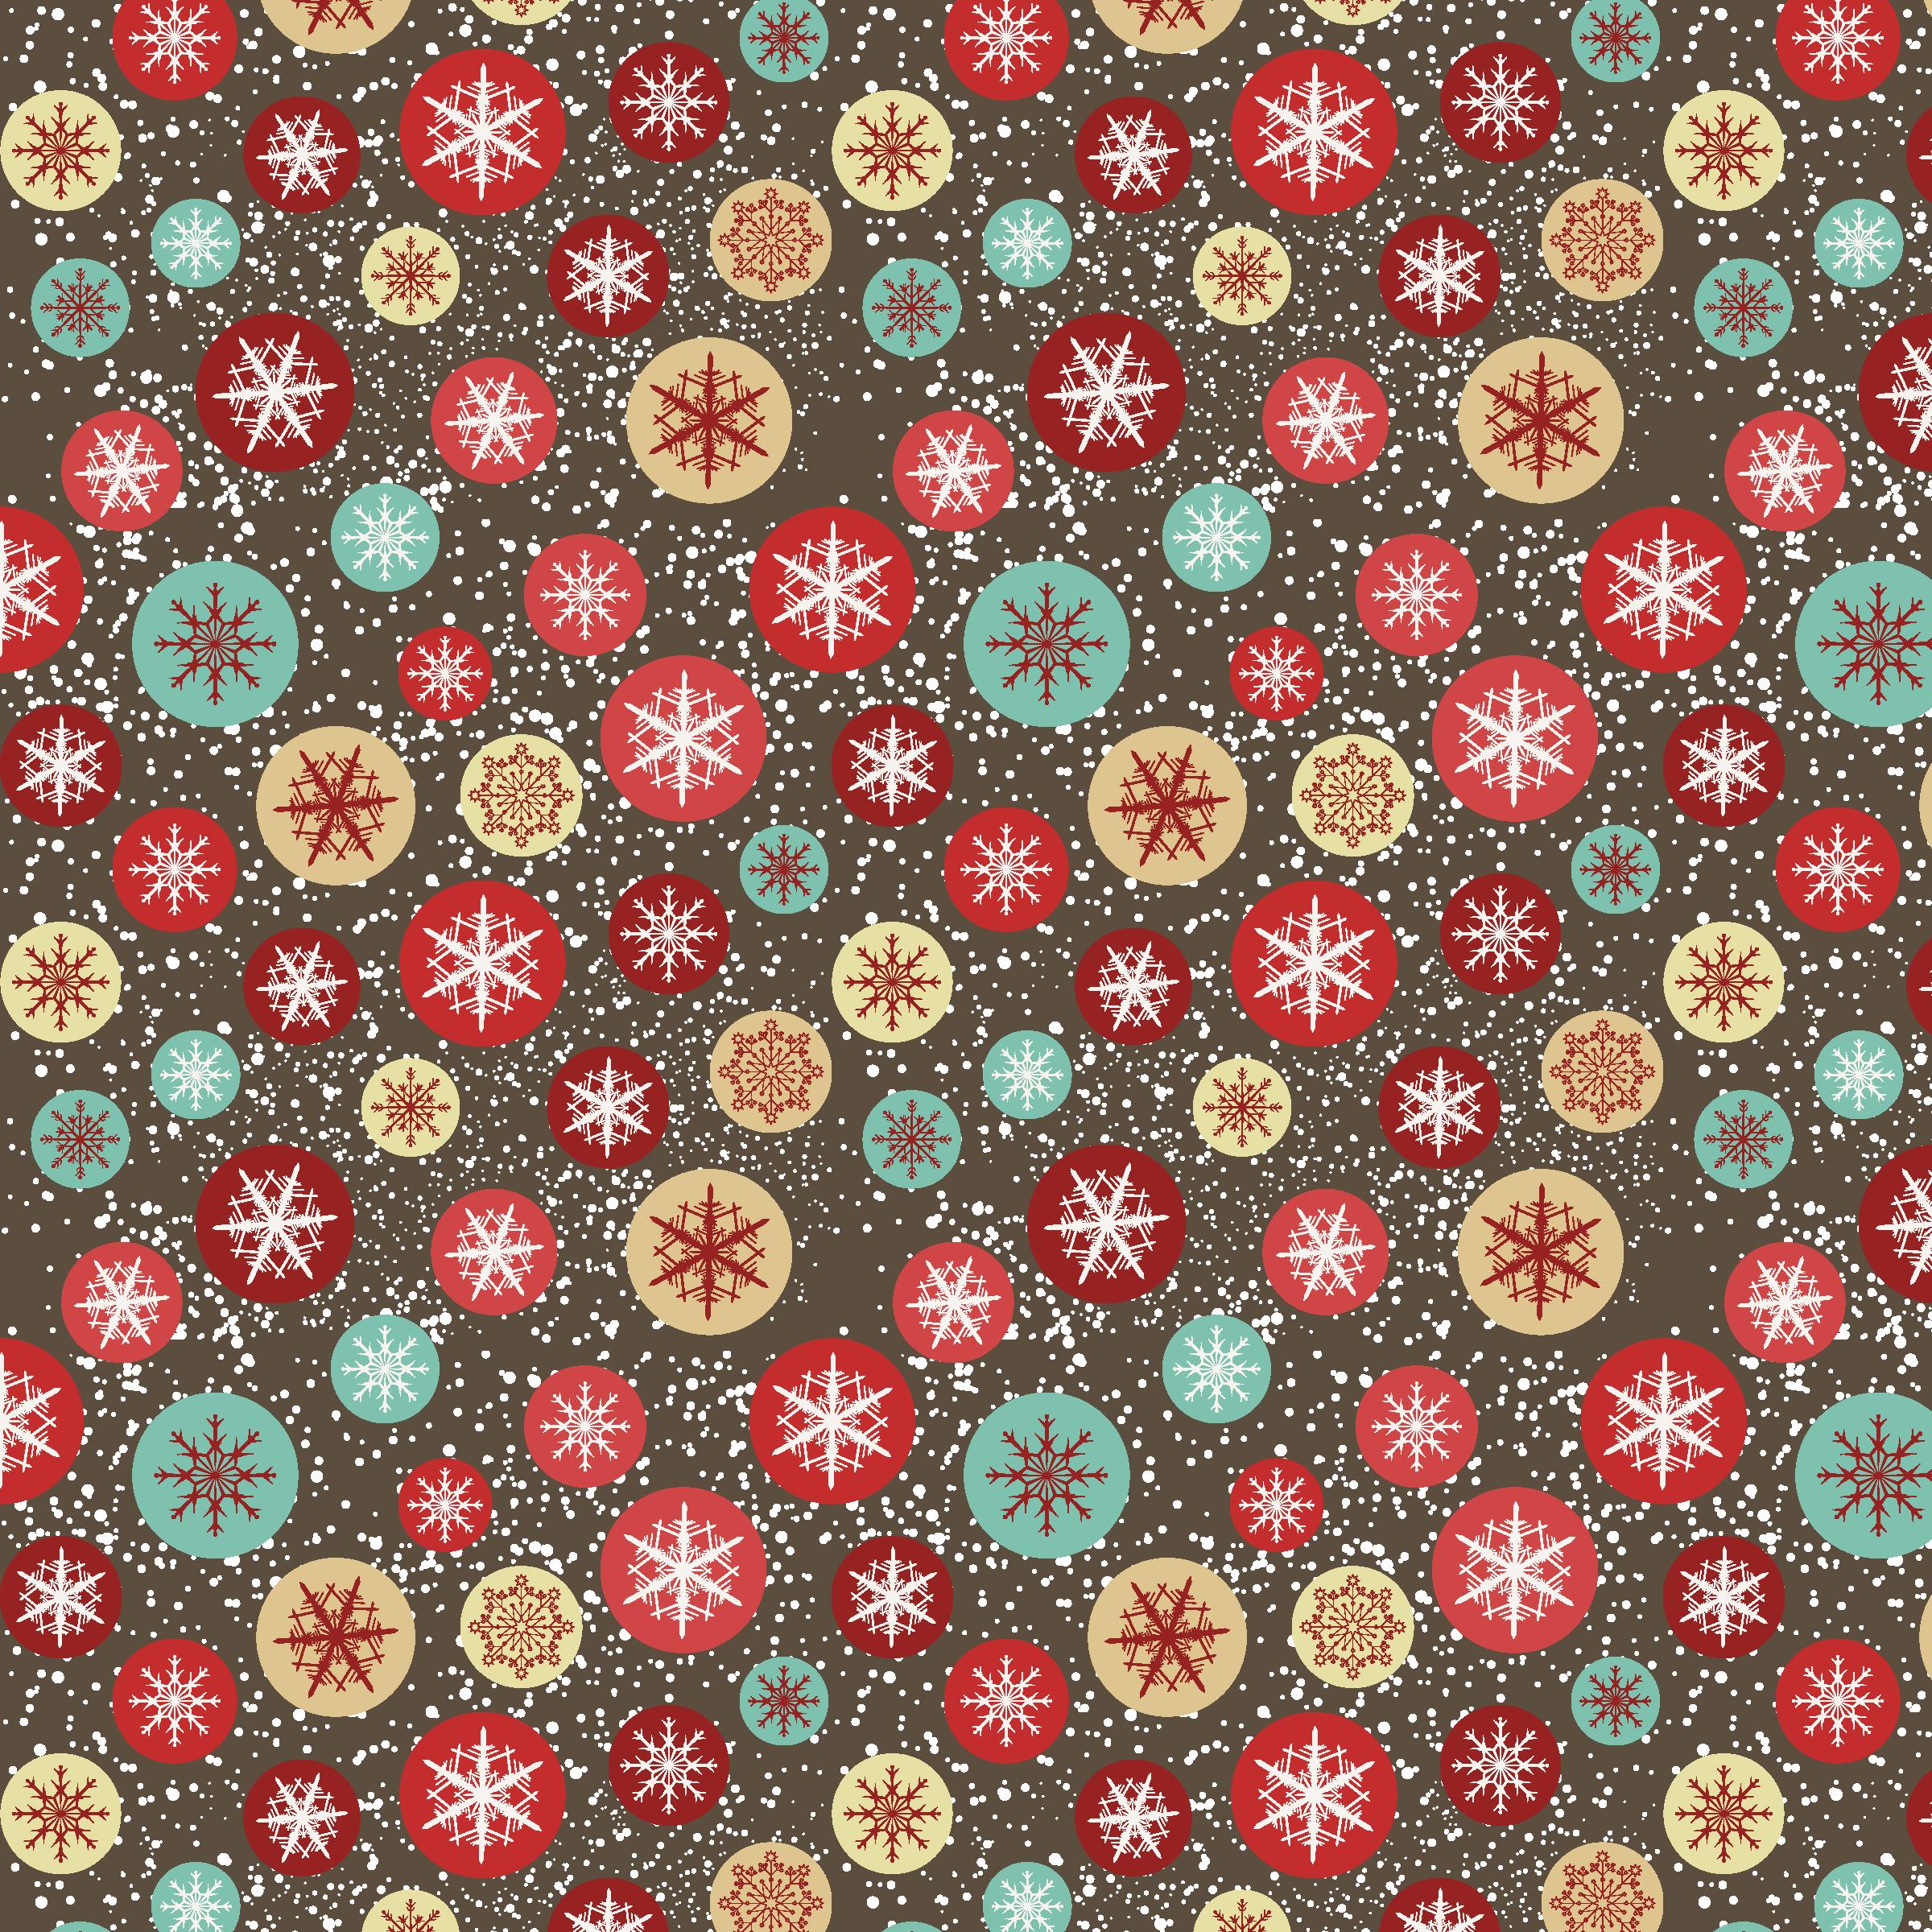 Snowflake Holidays-03